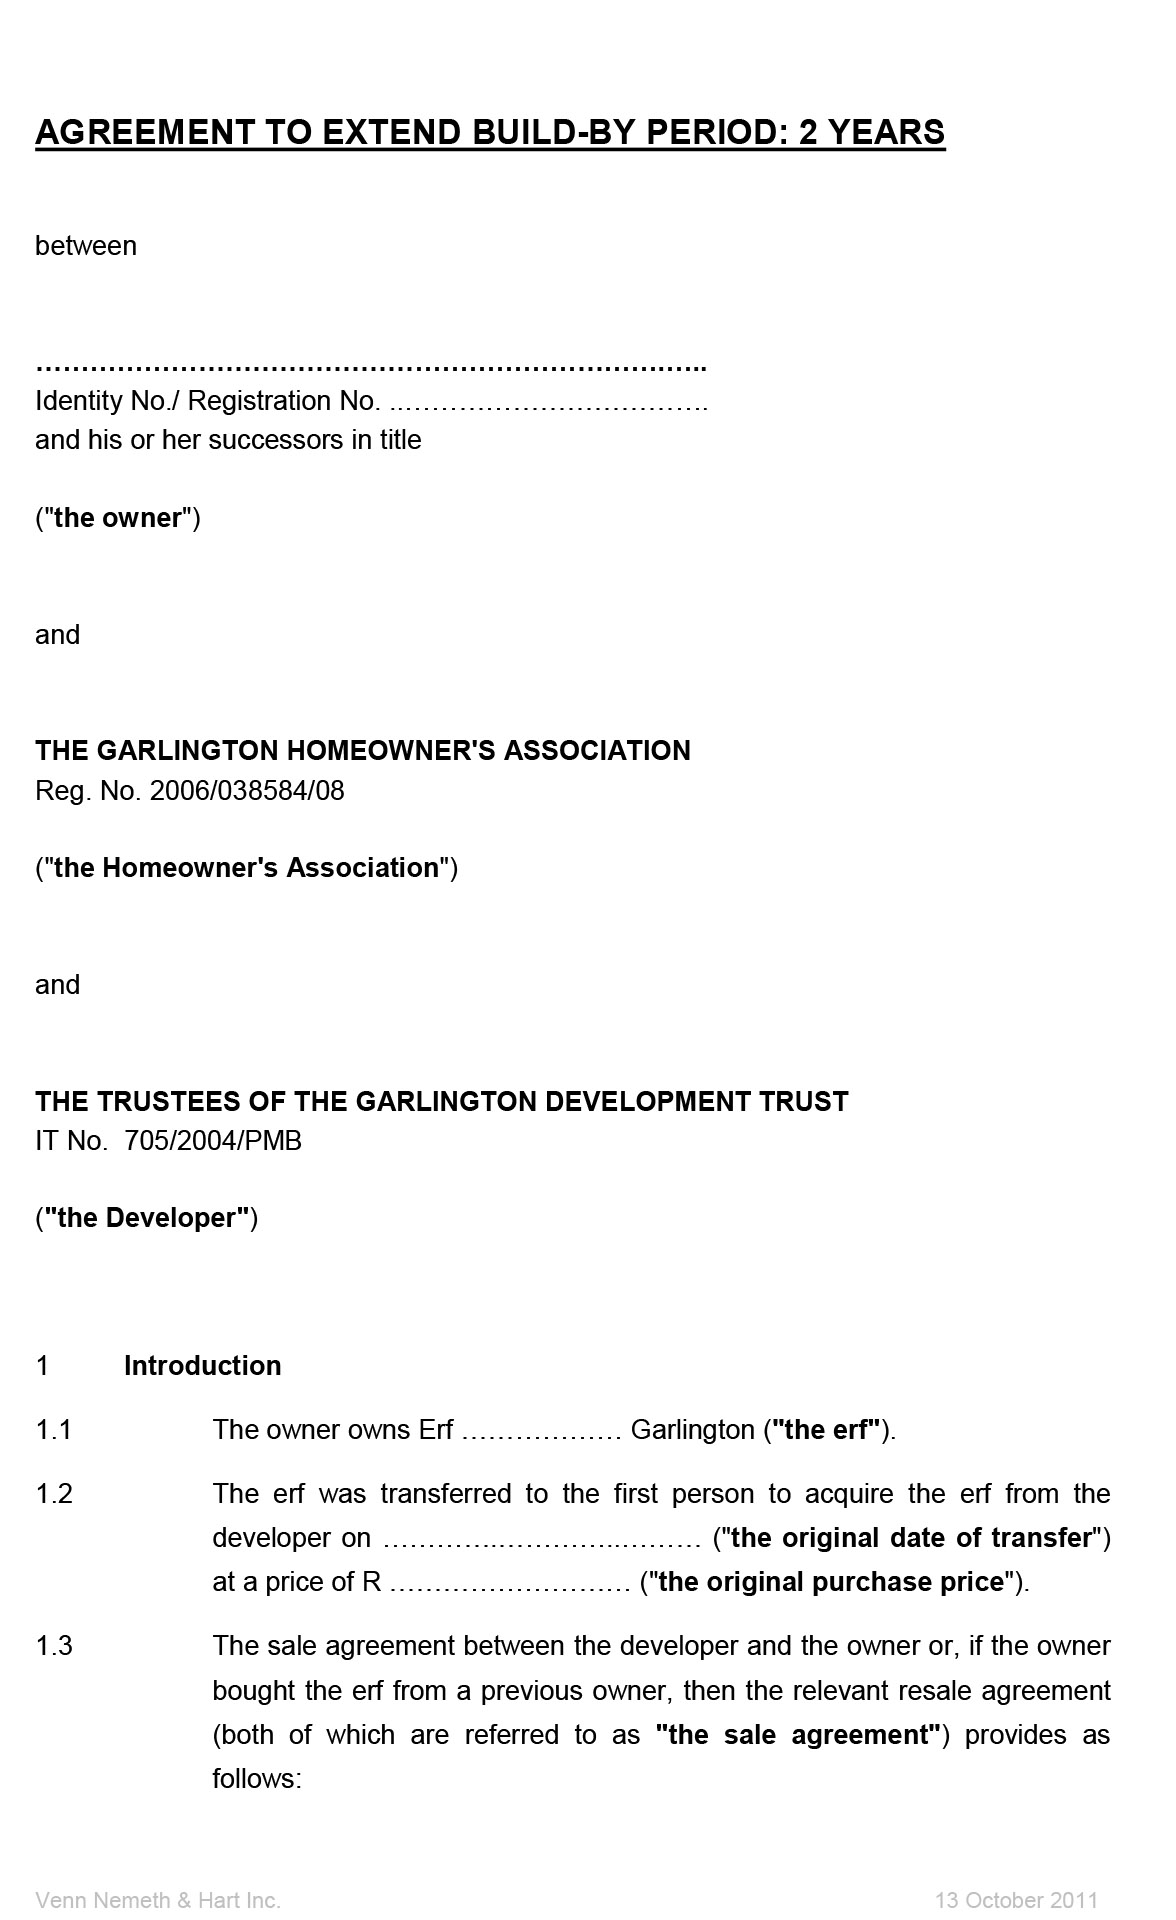 garlington_penality agr_two years_01